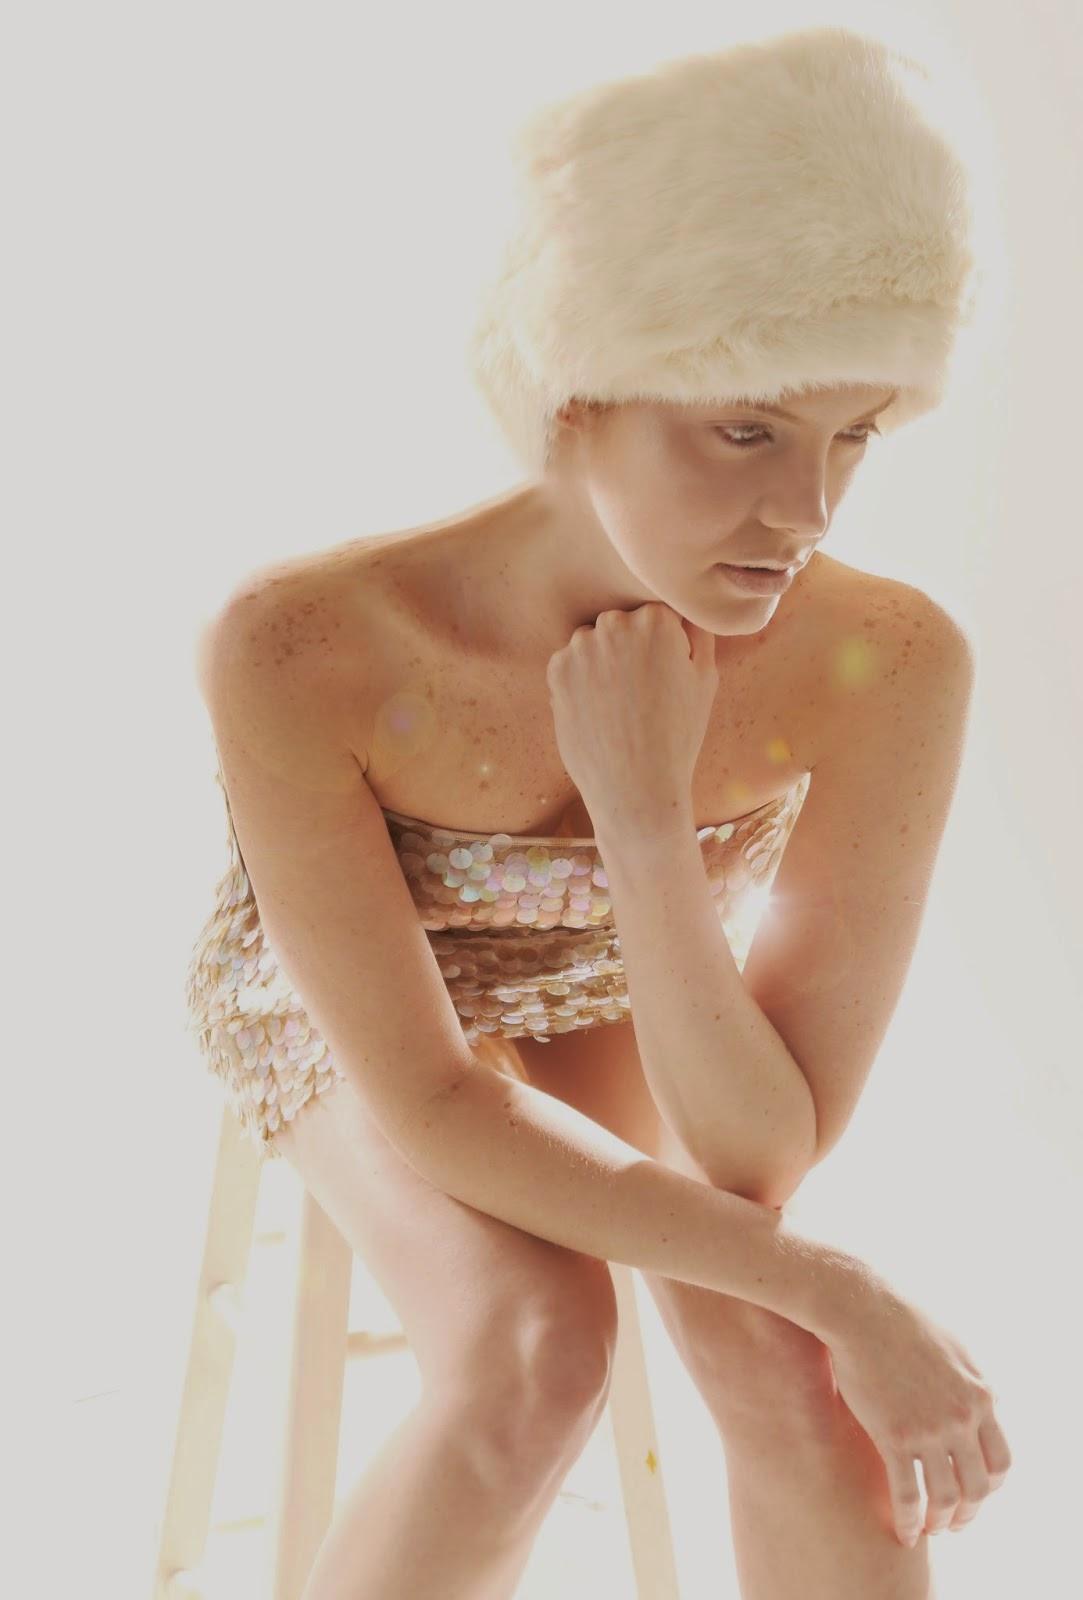 alexandra braun, miss earth 2005. - Página 5 Oyn3md2k